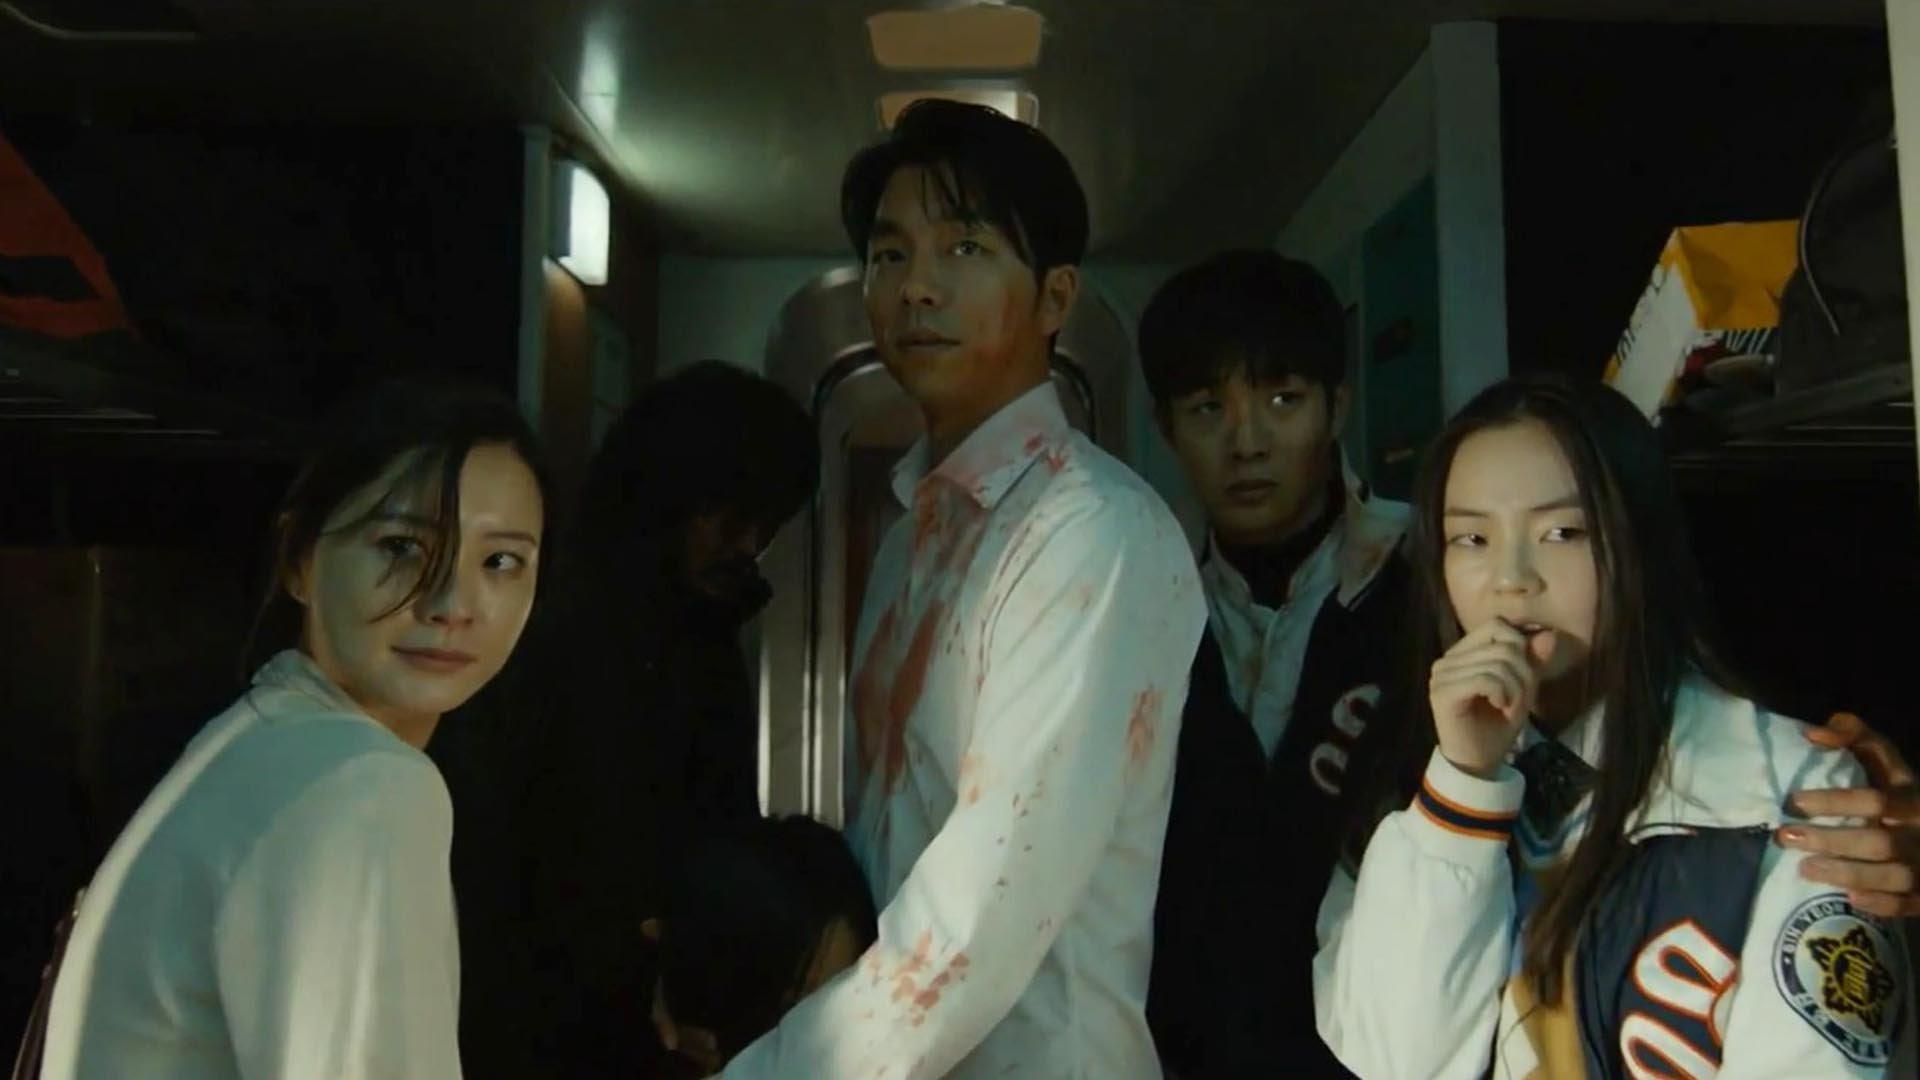 Train to Busan di Yeon Sang-ho